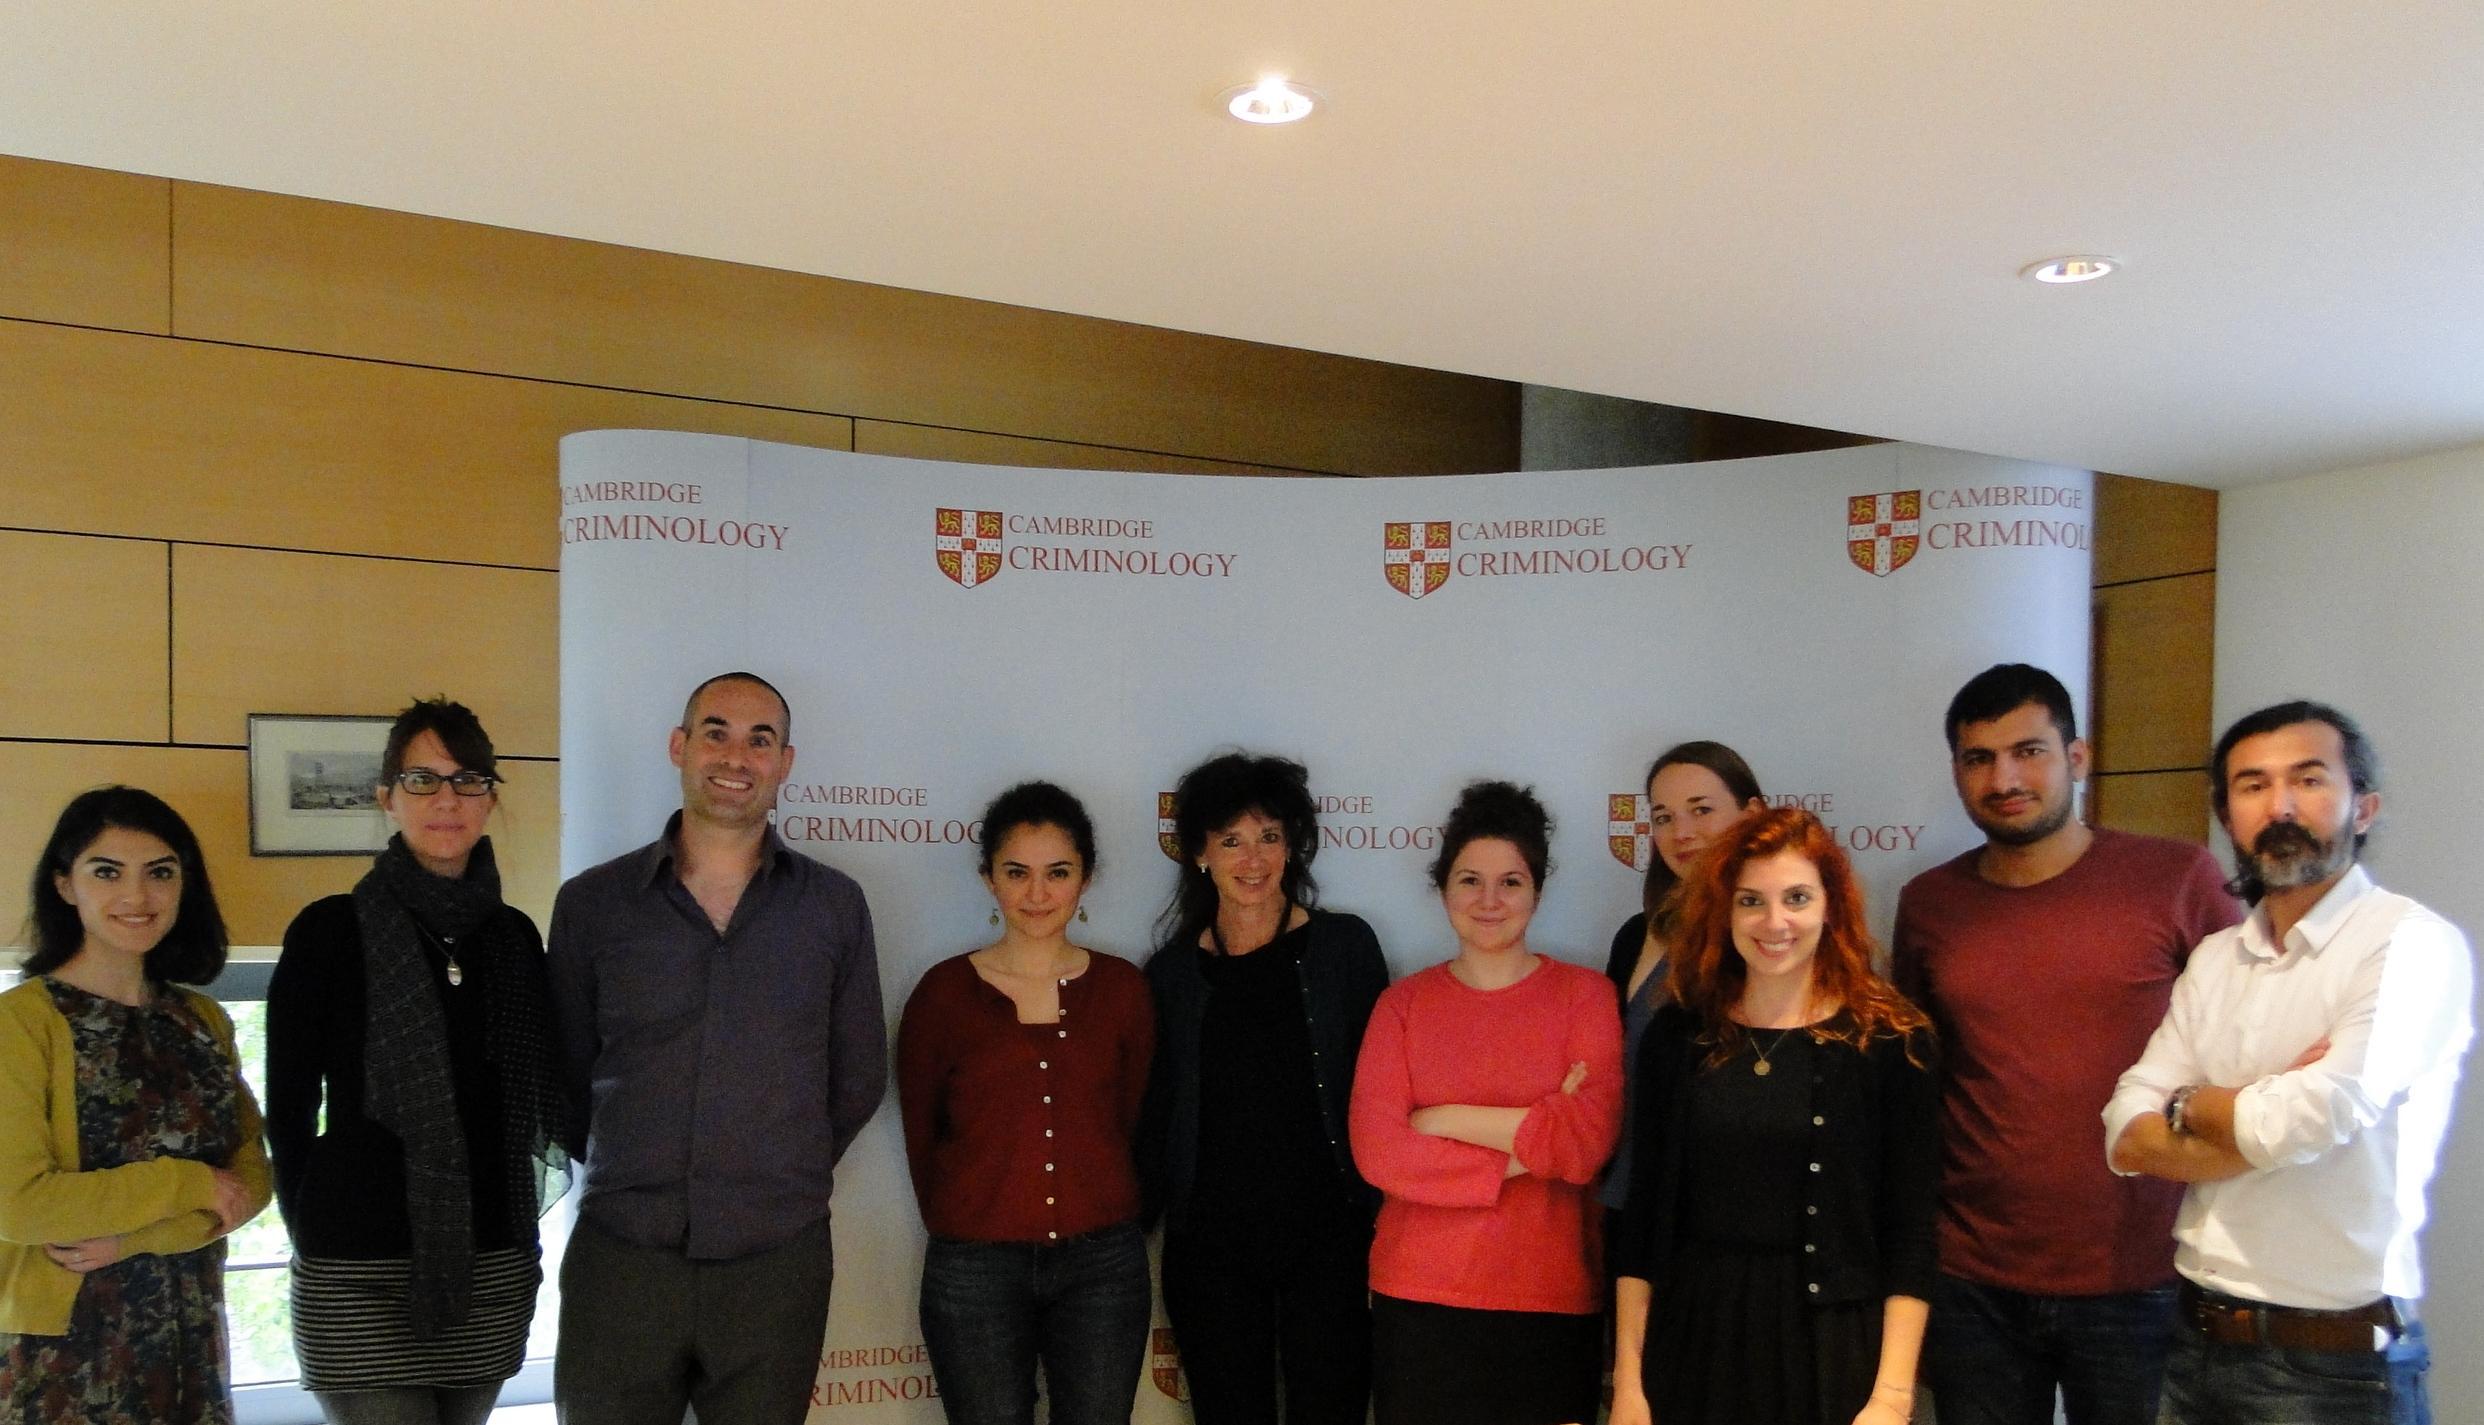 Turkey's Center for Prison Studies visited Prisons Research Centre